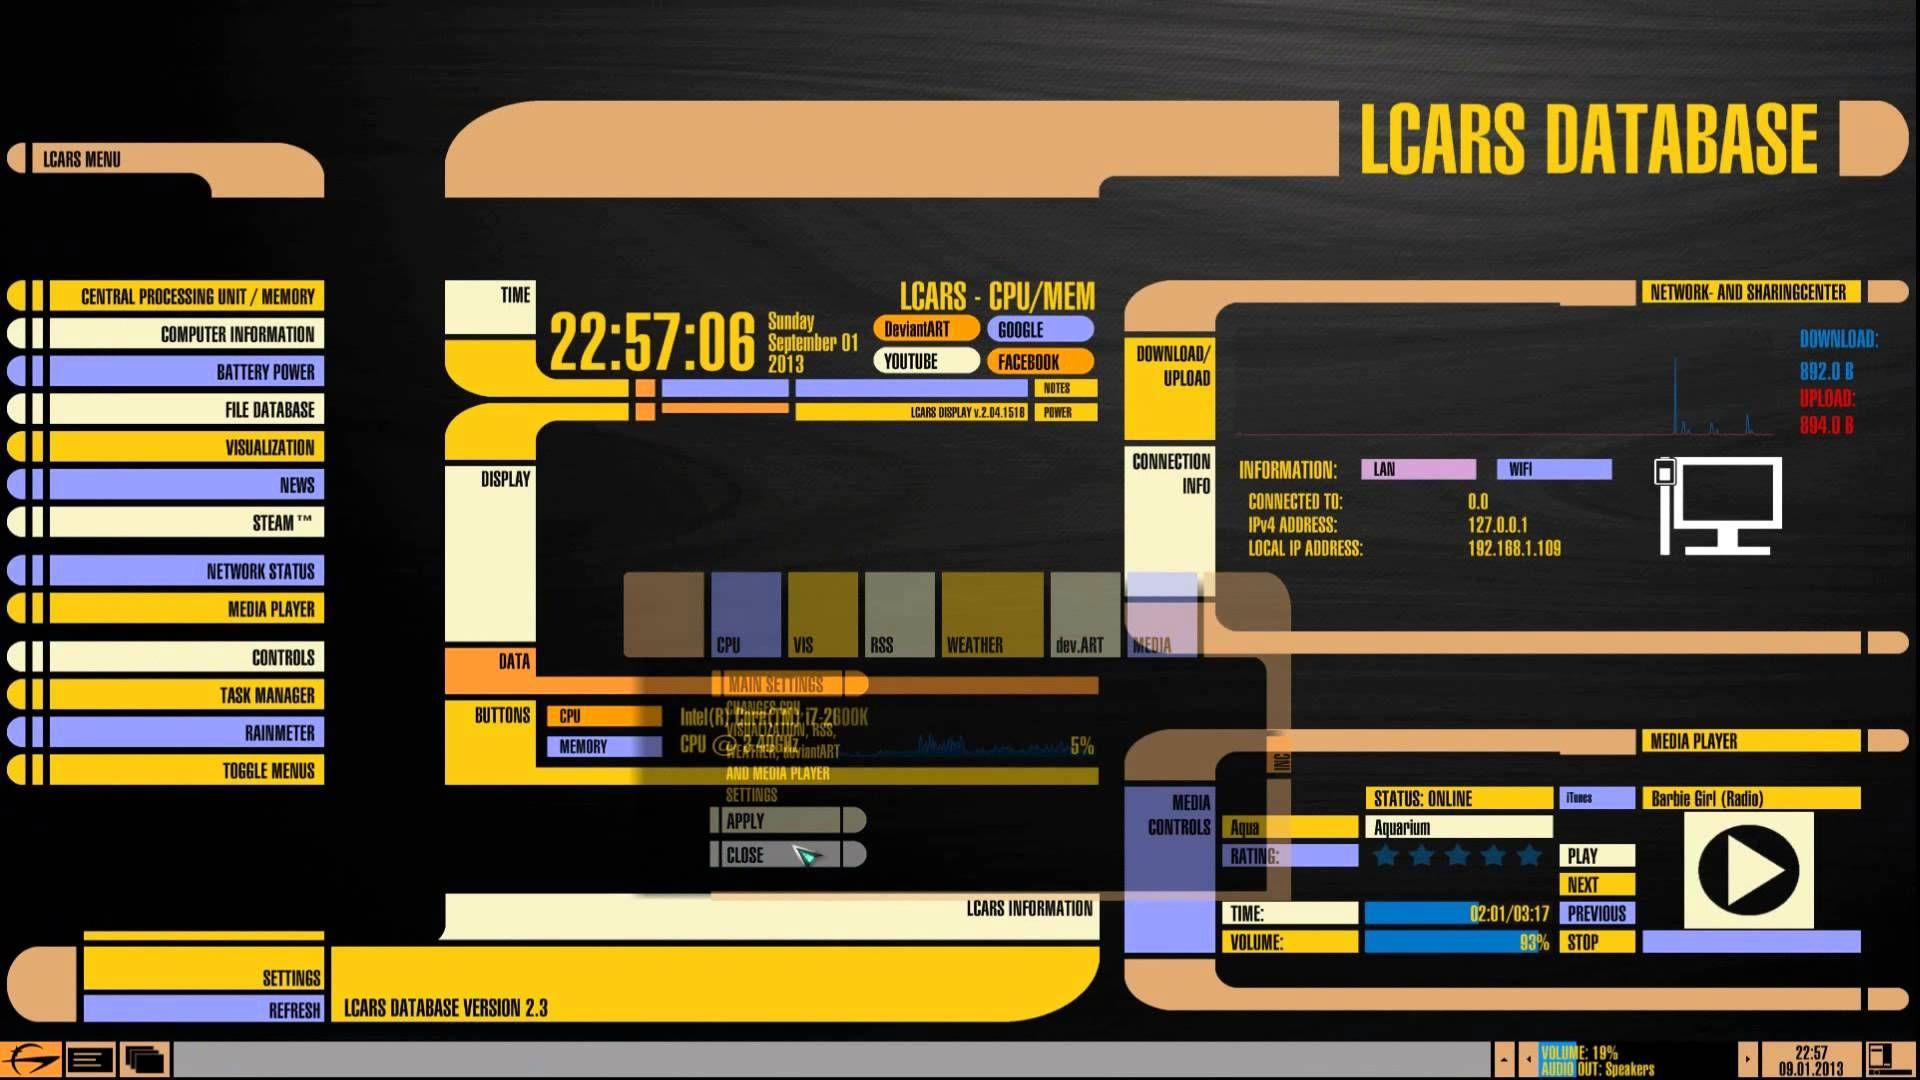 Star Trek Tng Hd Wallpaper Wallpapersafari Star Trek Body Pillow For Stars